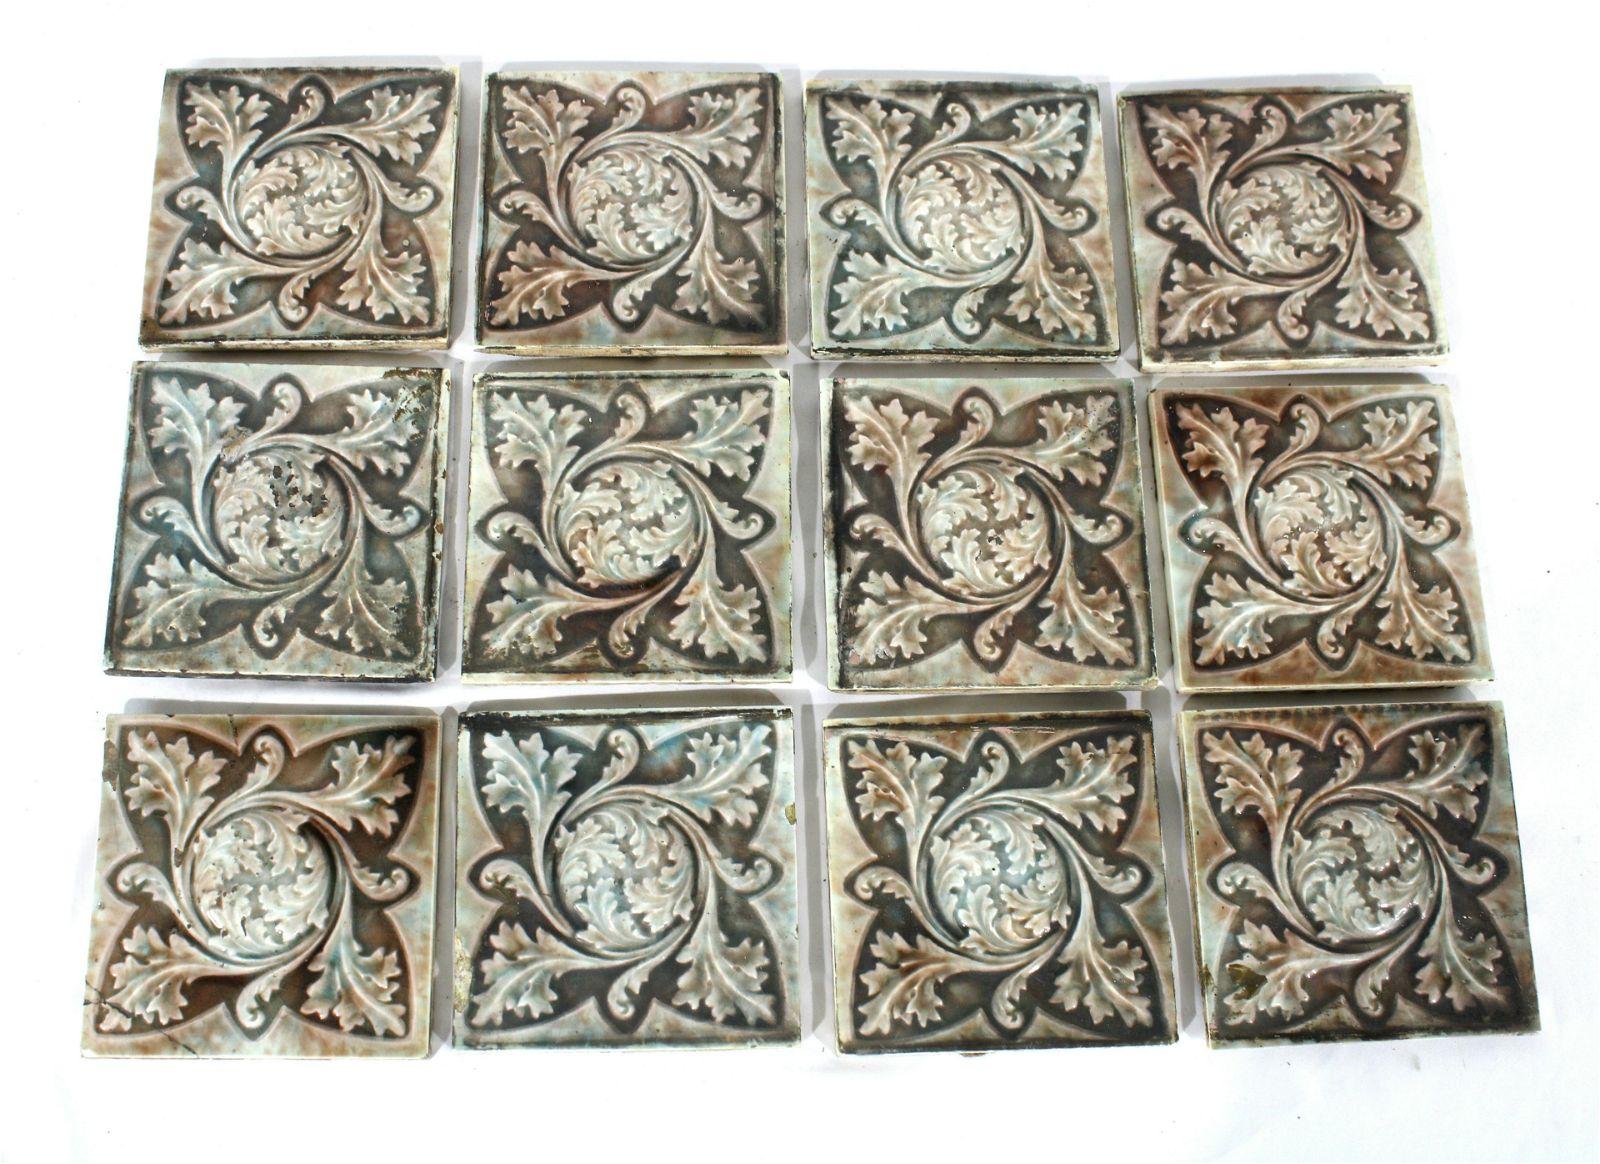 Trent Fireplace Tiles, Set of 12